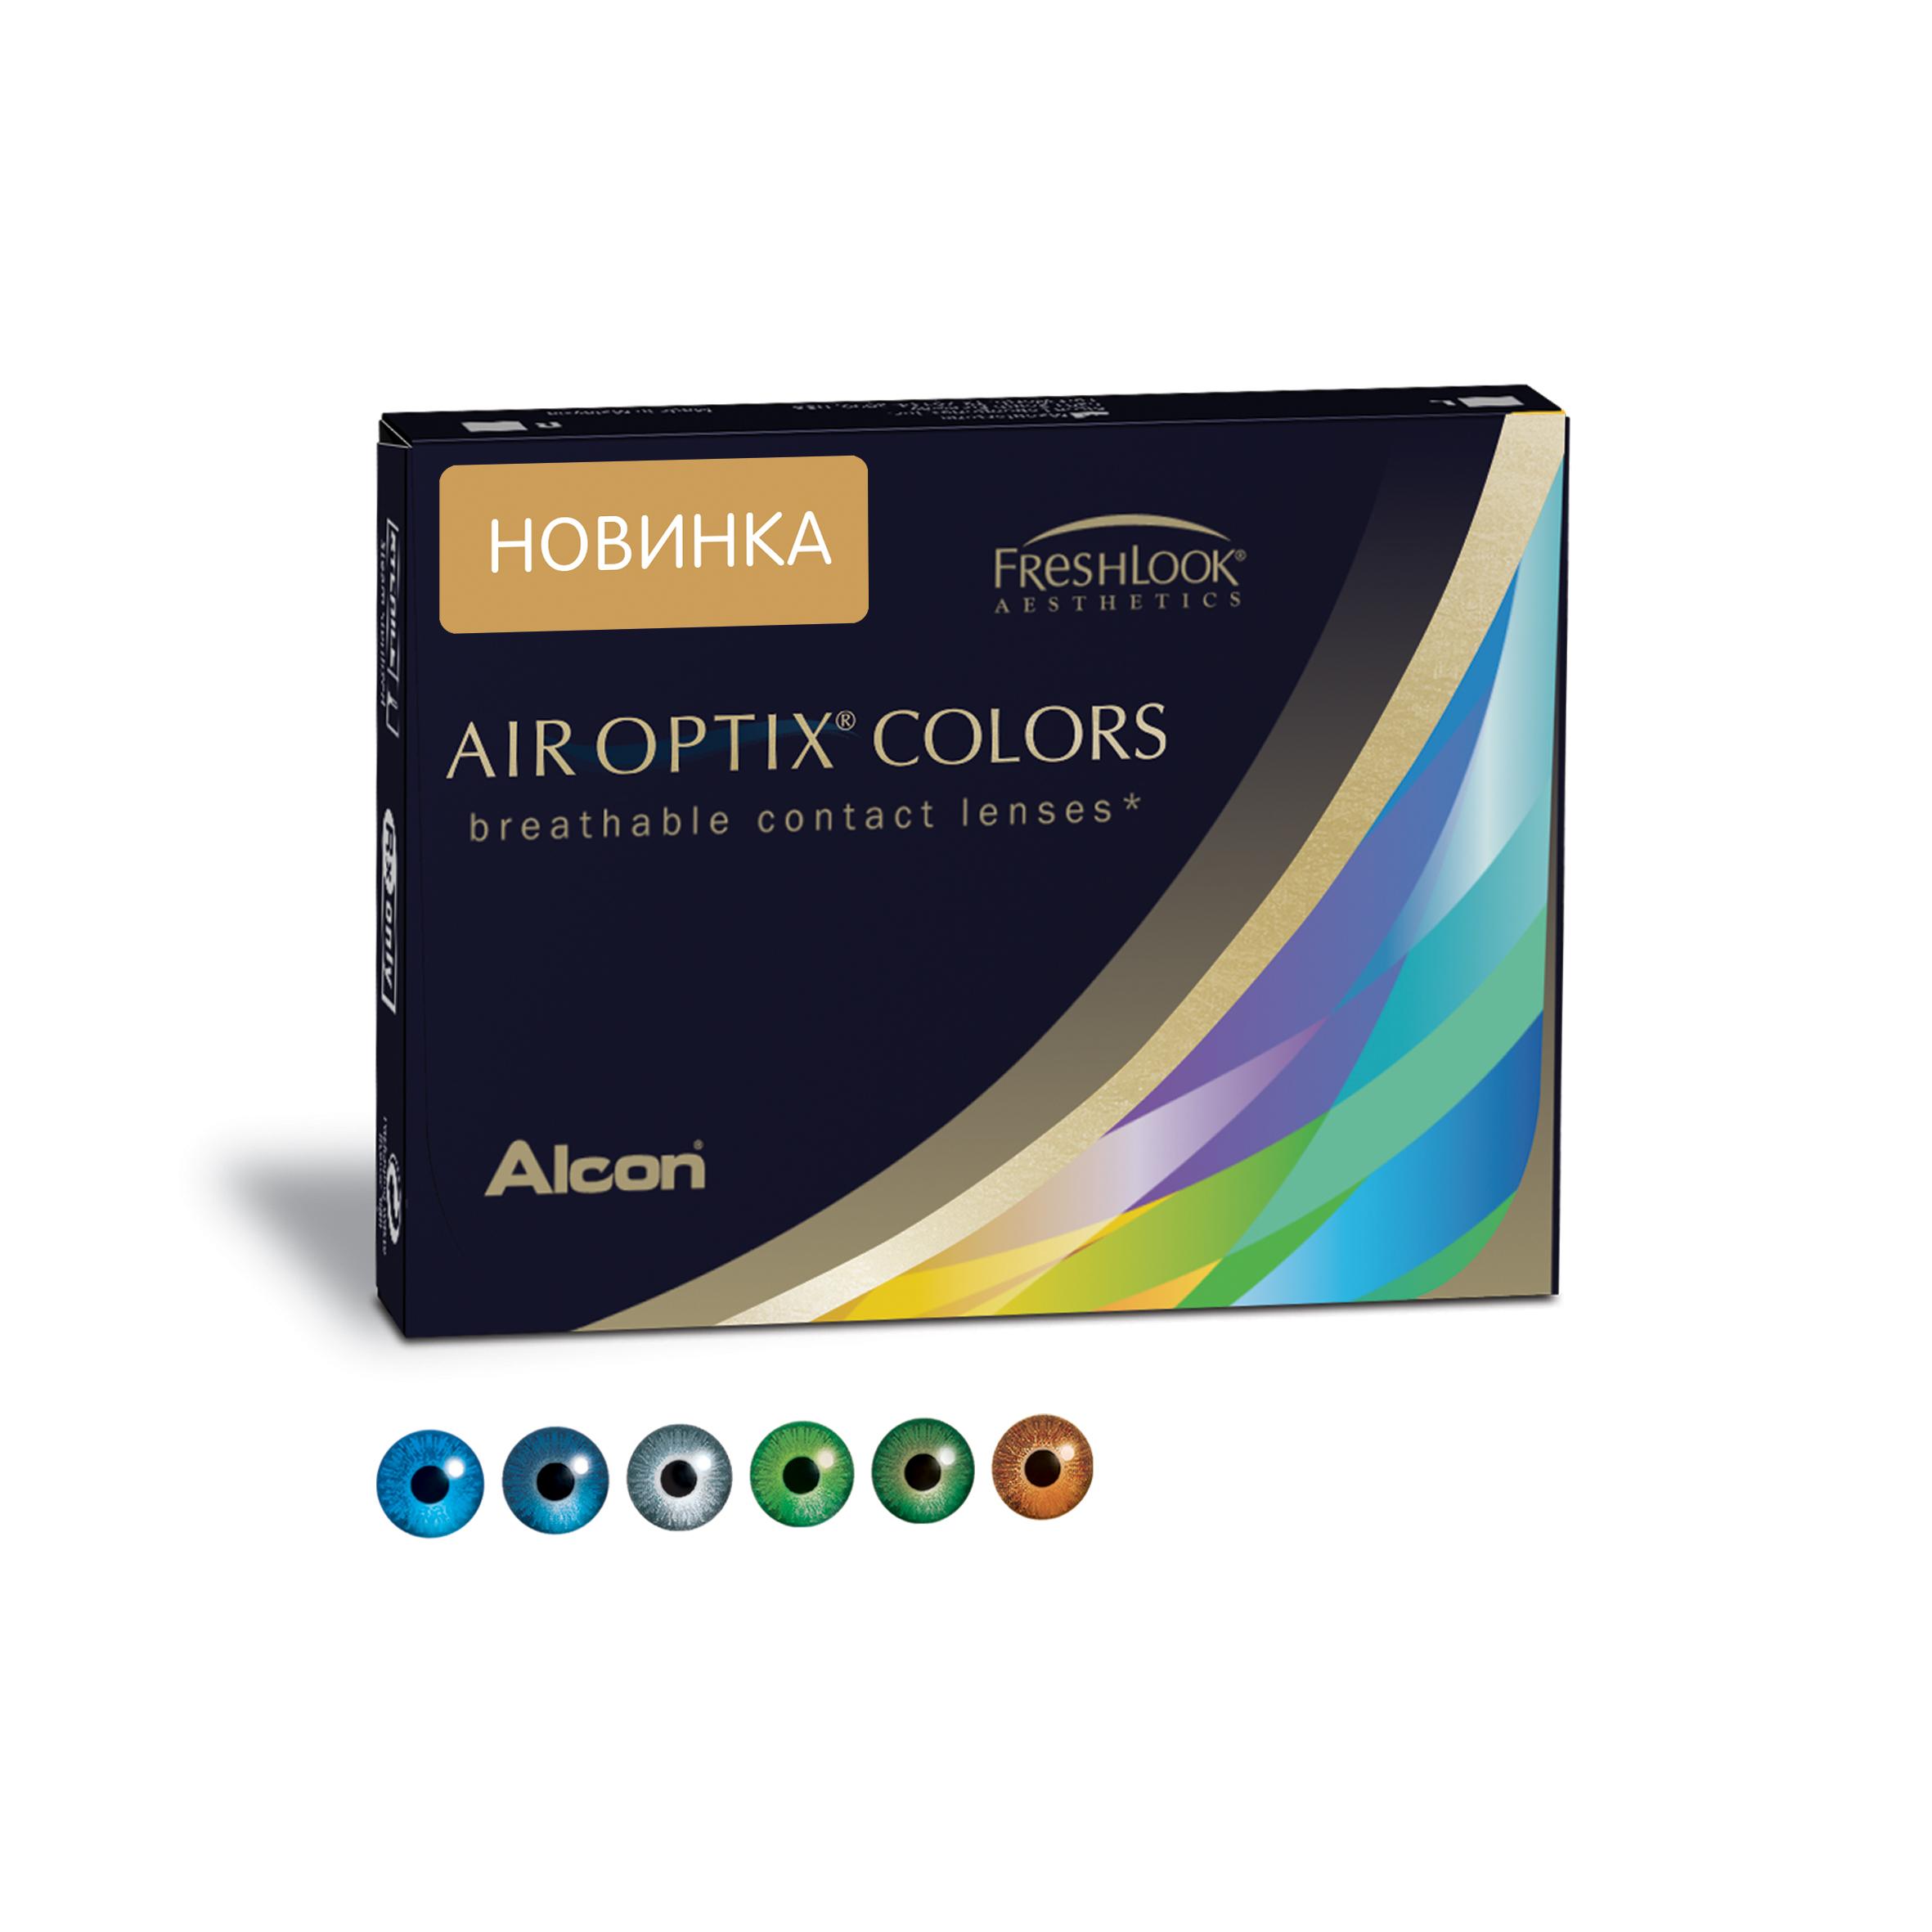 Аlcon контактные линзы Air Optix Colors 2 шт -5.75 Gemstone Green31746295Мягкие контактные линзы